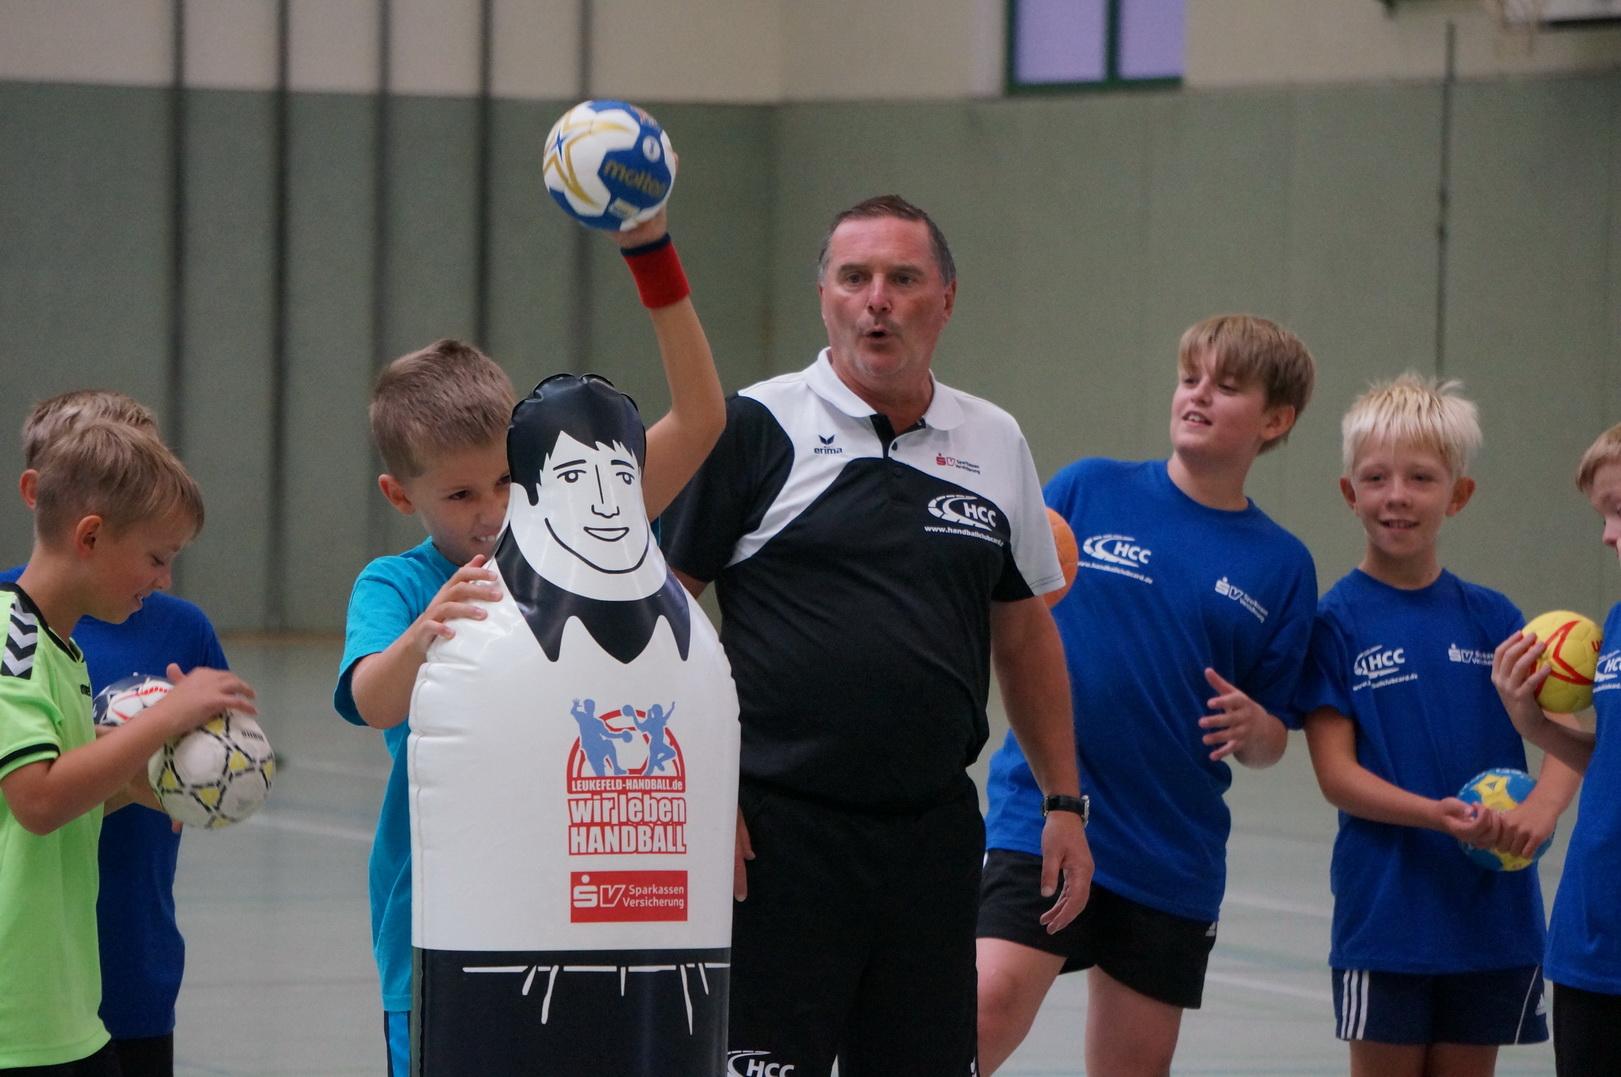 201808_Handballcamp_SDH_MG_230w